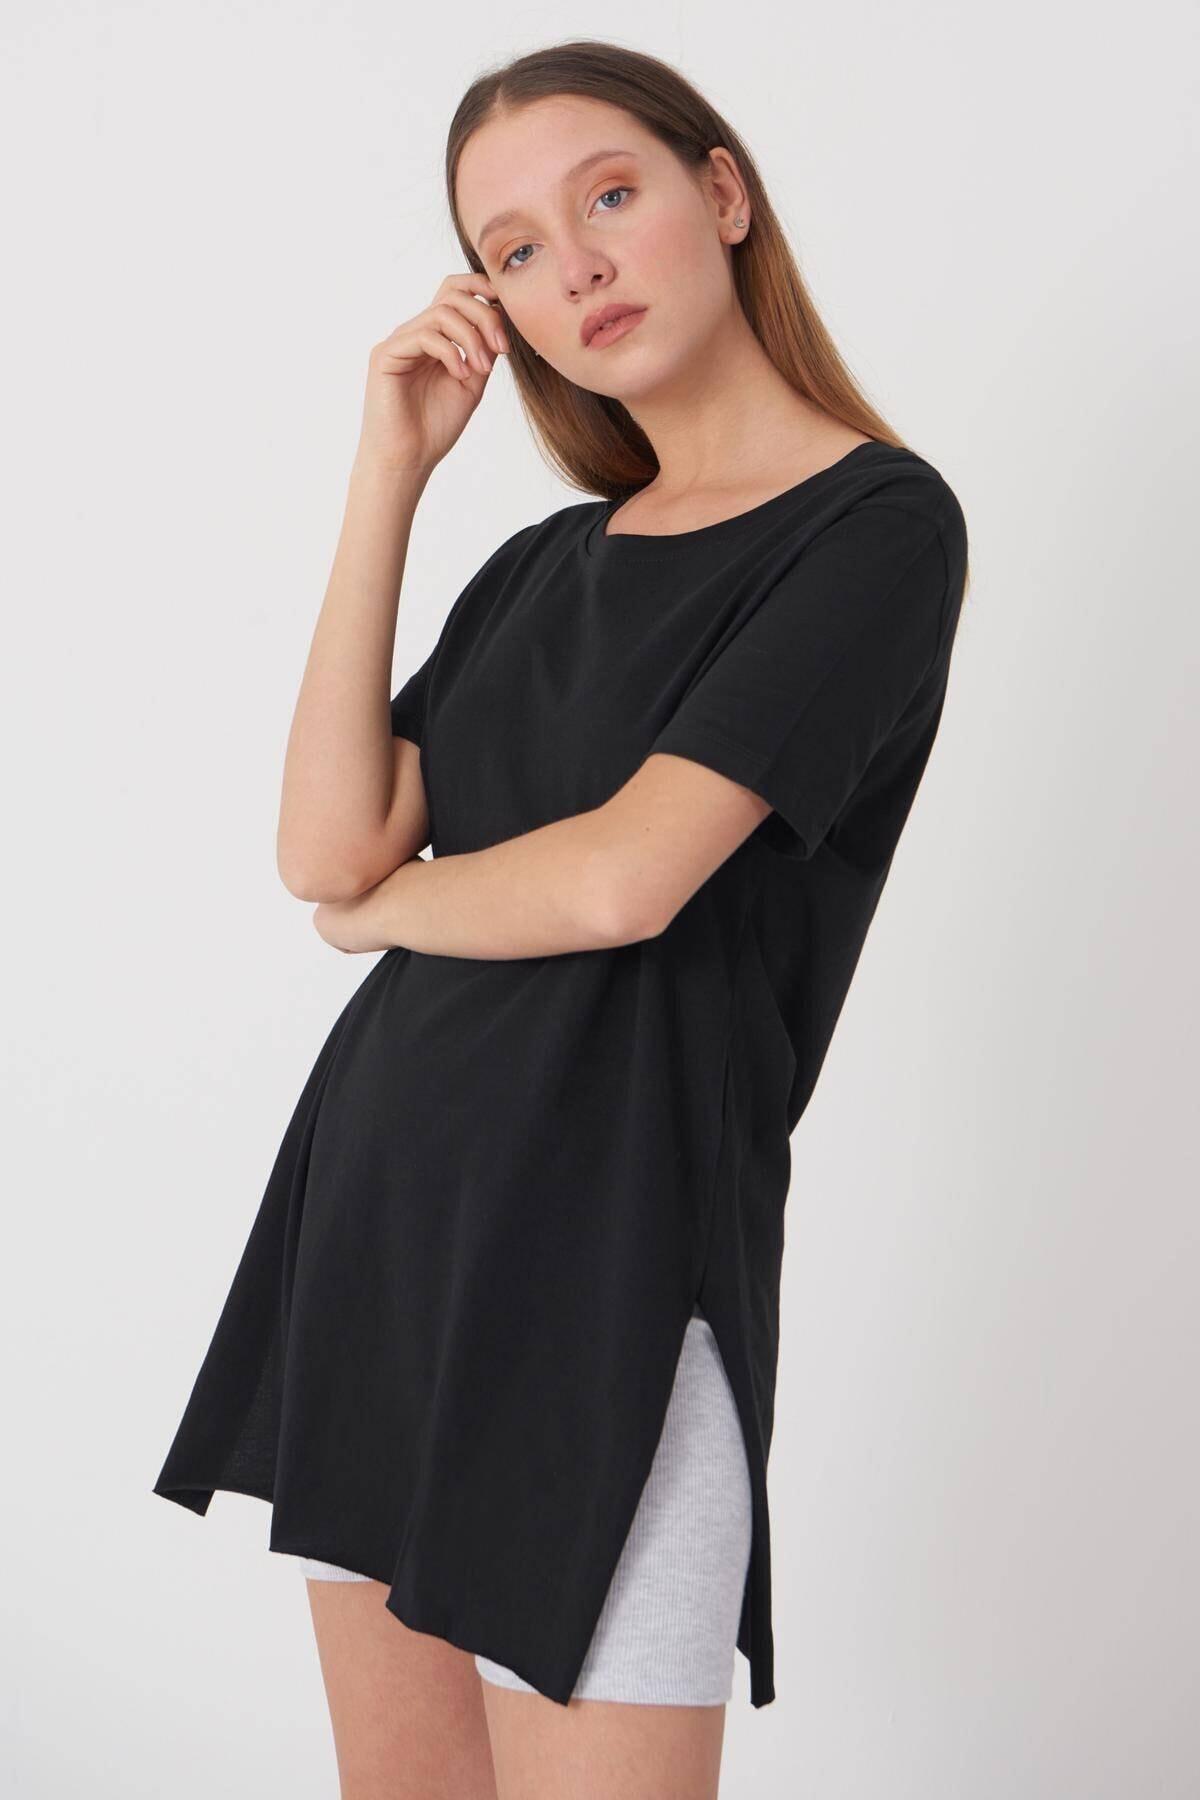 Addax Kadın Siyah Bisiklet Yaka T-Shirt P0101 - U4 - Z1 Adx-00007204 1